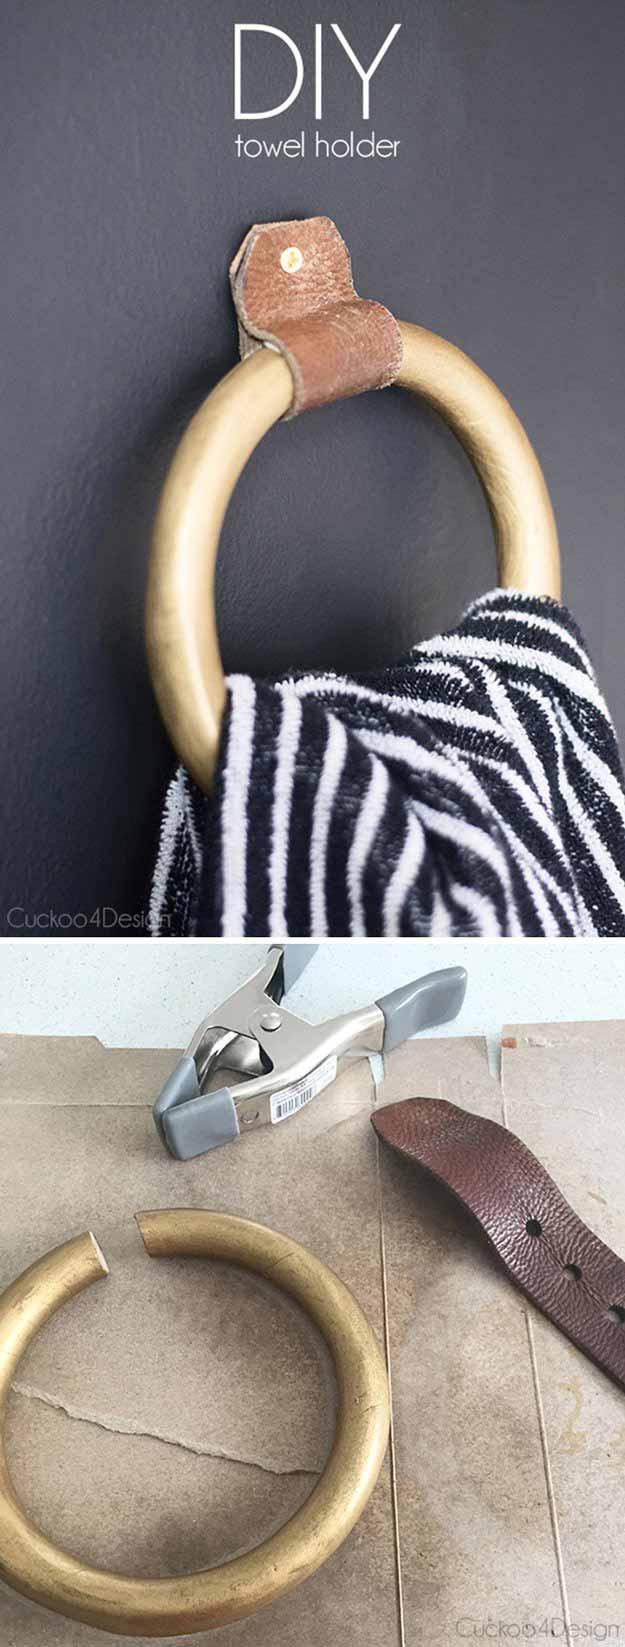 DIY Towel Holder & Amazing Bathroom Decorating Ideas on a Budget - House Good